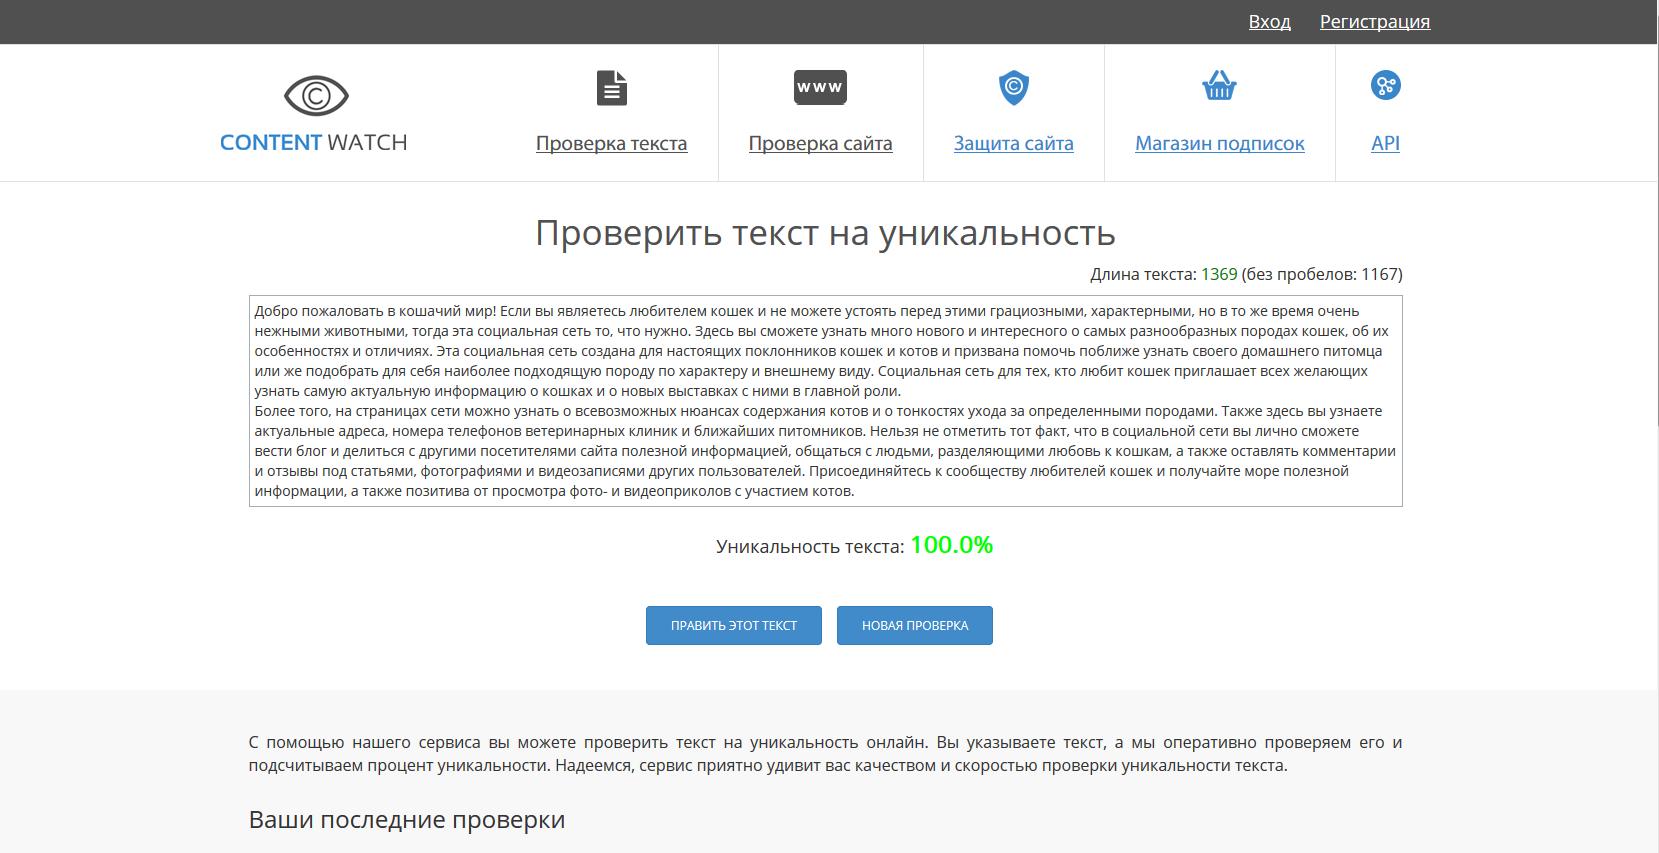 Интерфейс www.content-watch.ru